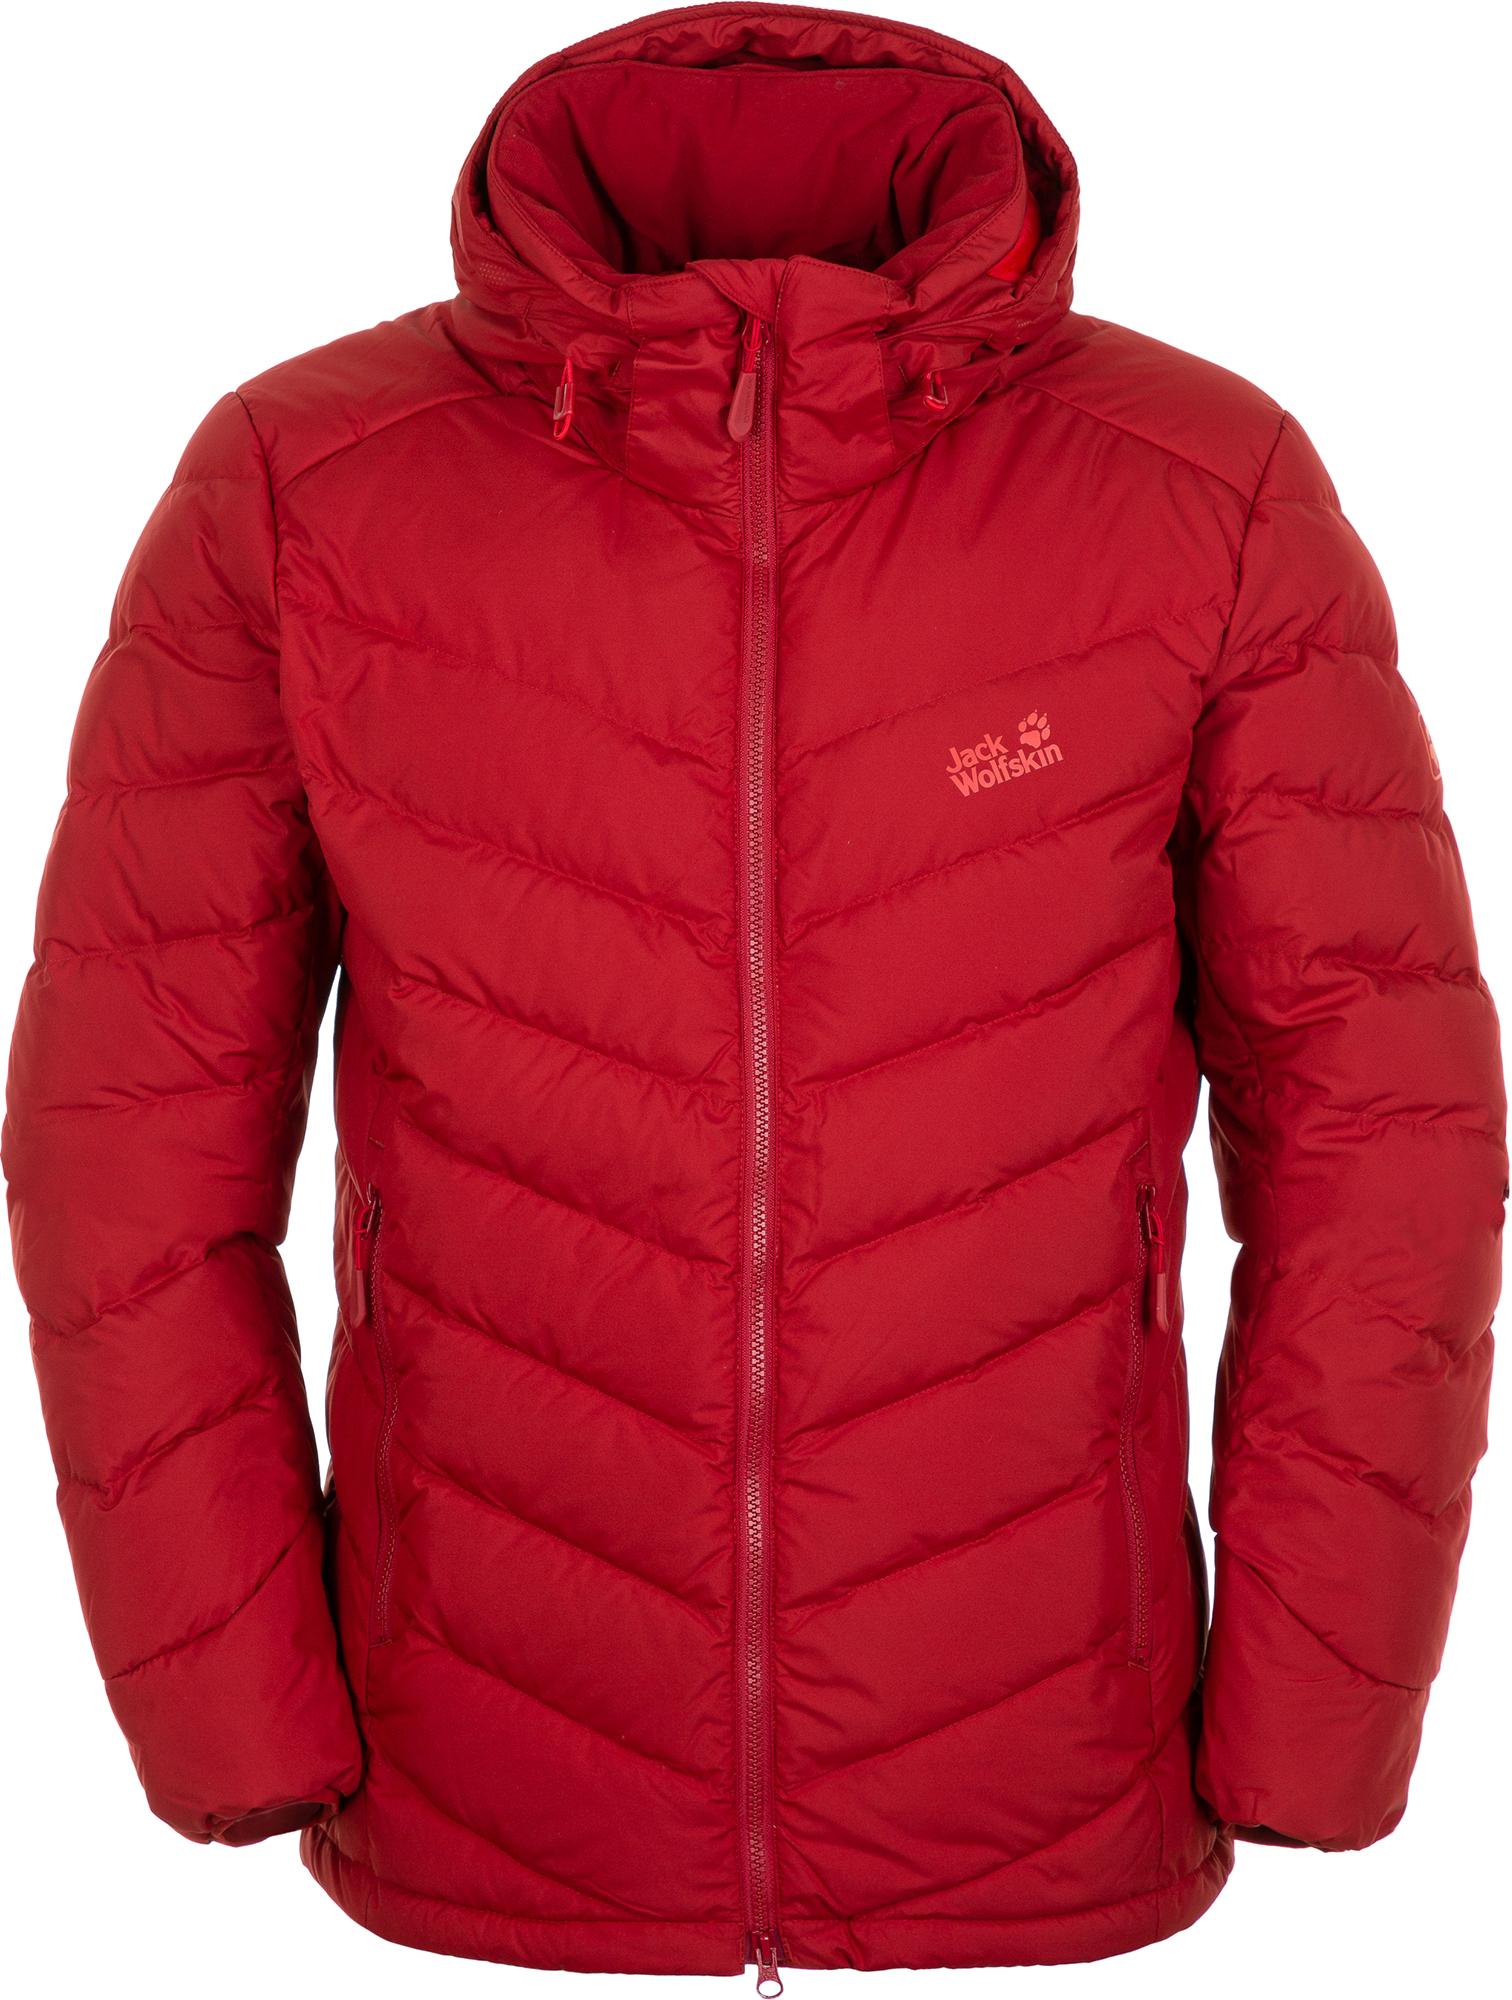 Jack Wolfskin Куртка пуховая мужская Fairmont, размер 58